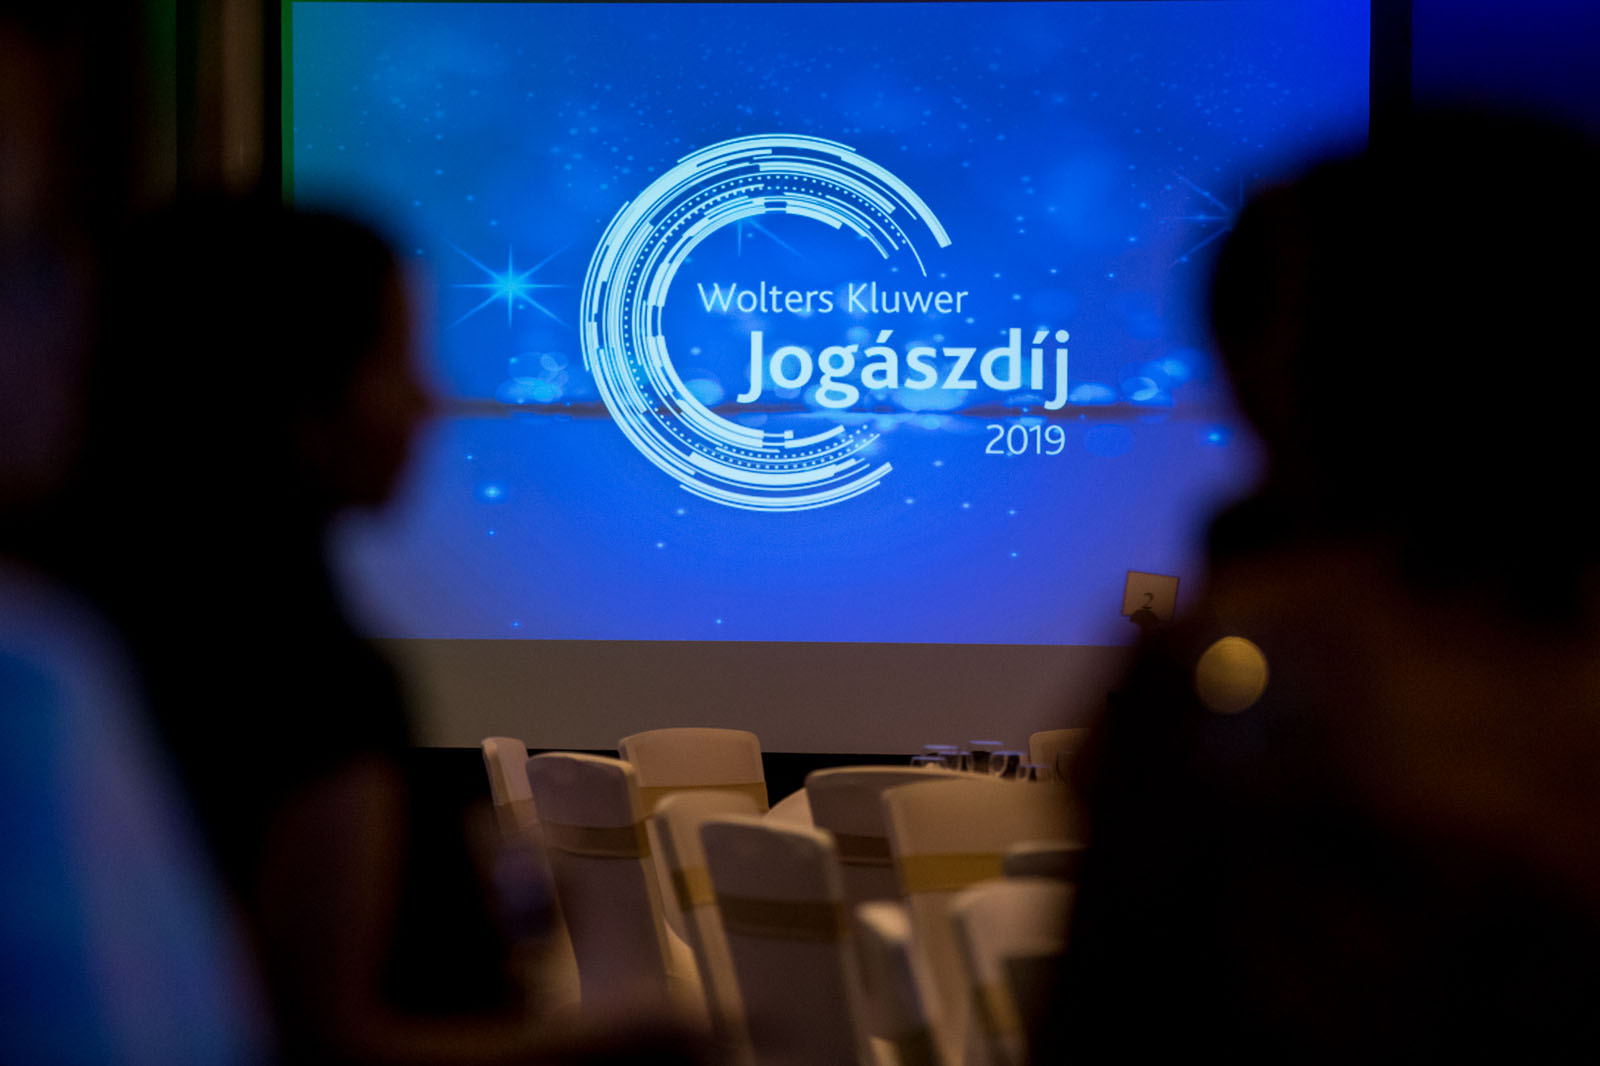 jogaszdij2019-Jogaszdij-nyitokepernyo